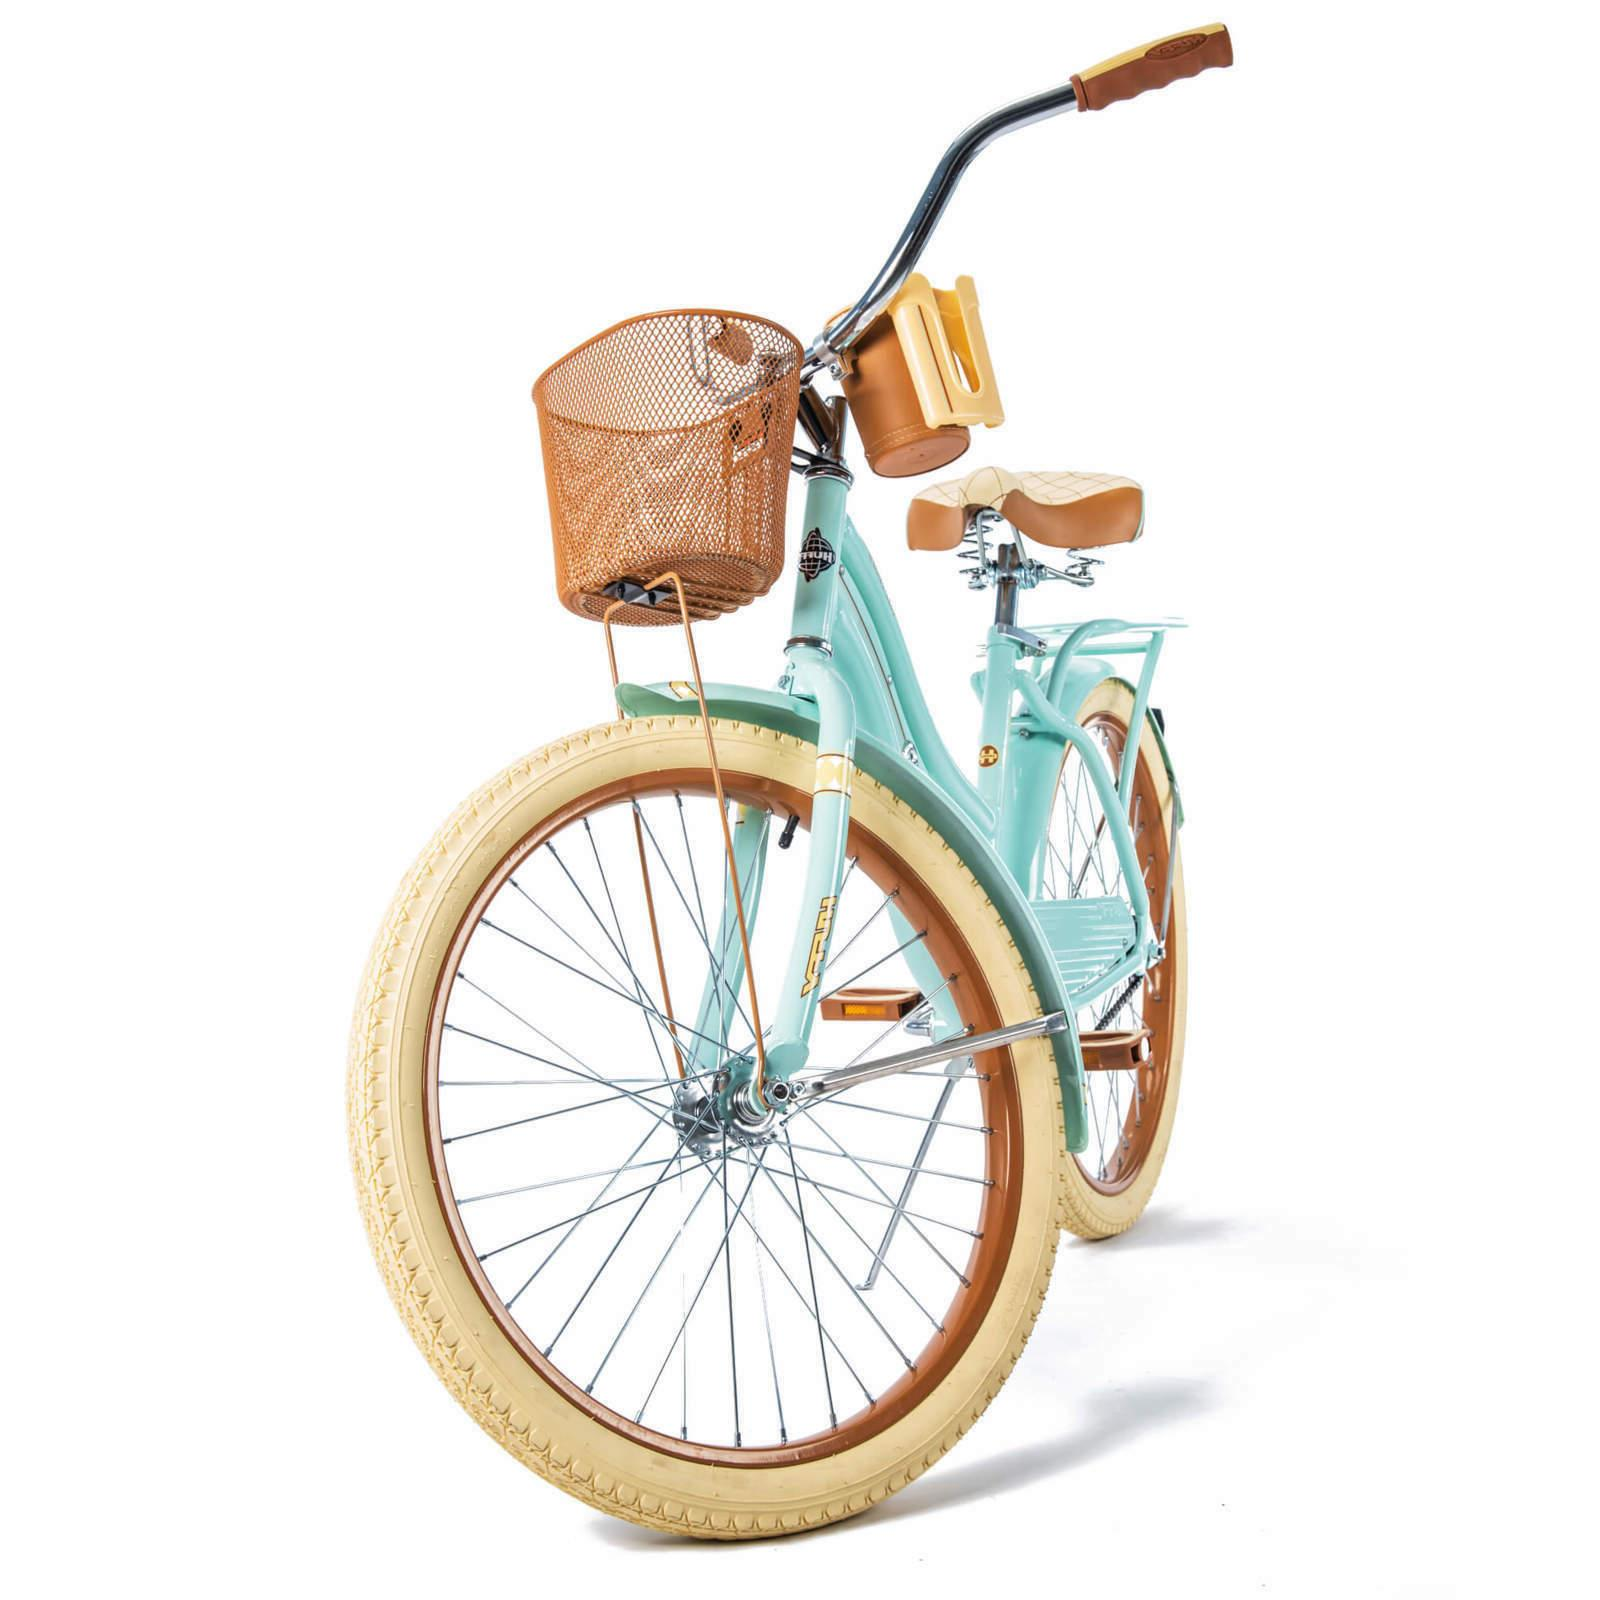 Huffy Cruiser Bike with Basket, Mint Green